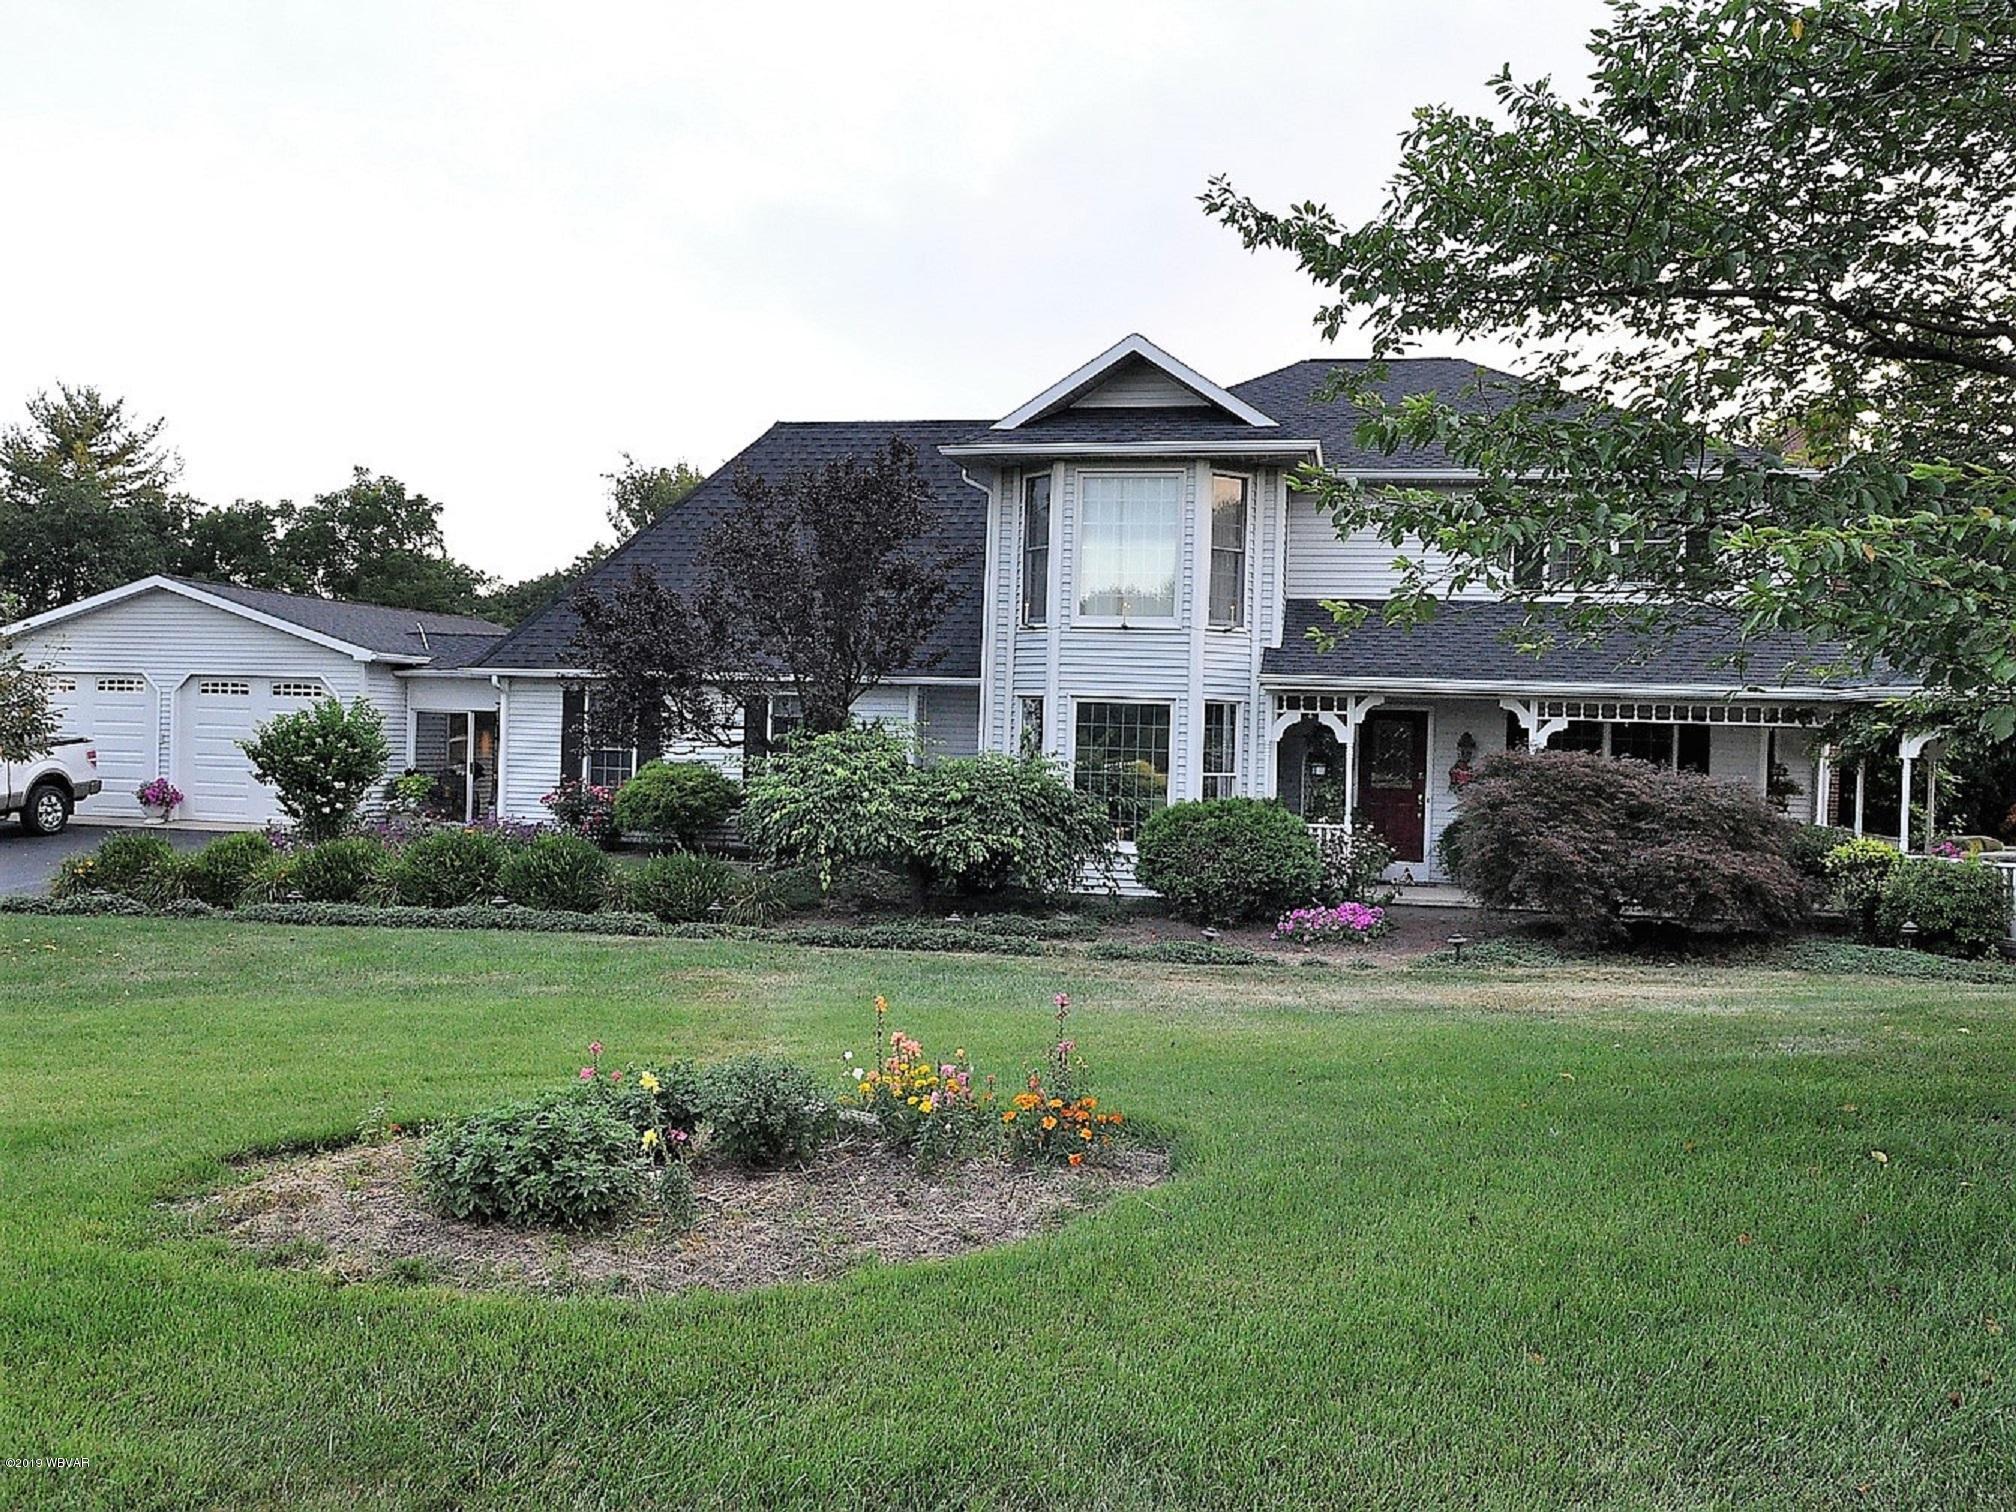 245 WINDY HILL LANE,Montoursville,PA 17754,4 Bedrooms Bedrooms,2.5 BathroomsBathrooms,Residential,WINDY HILL,WB-88574